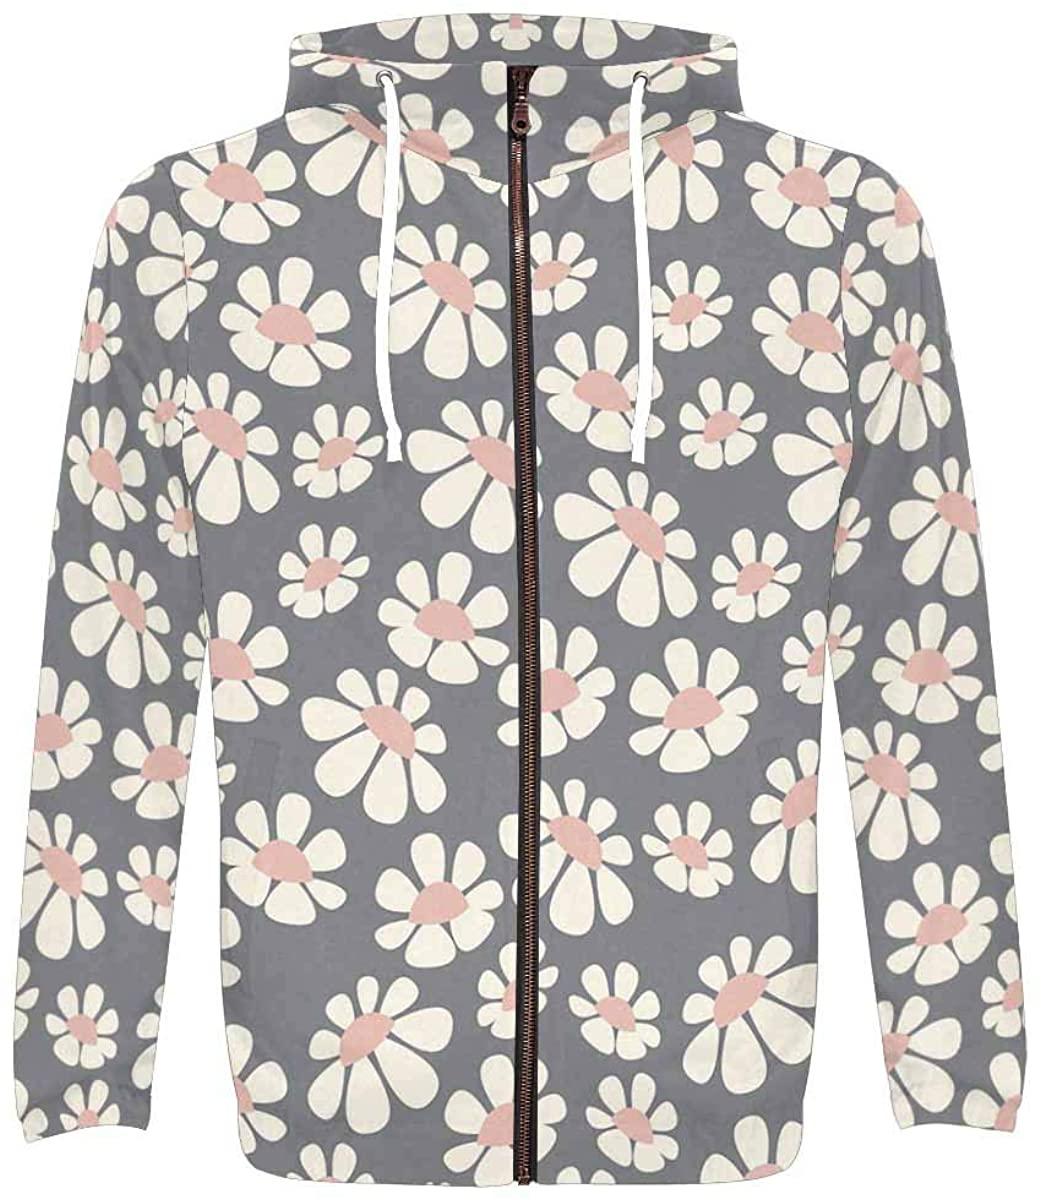 InterestPrint Men's Lightweight Full Zip Hoodie Flowers and Floral